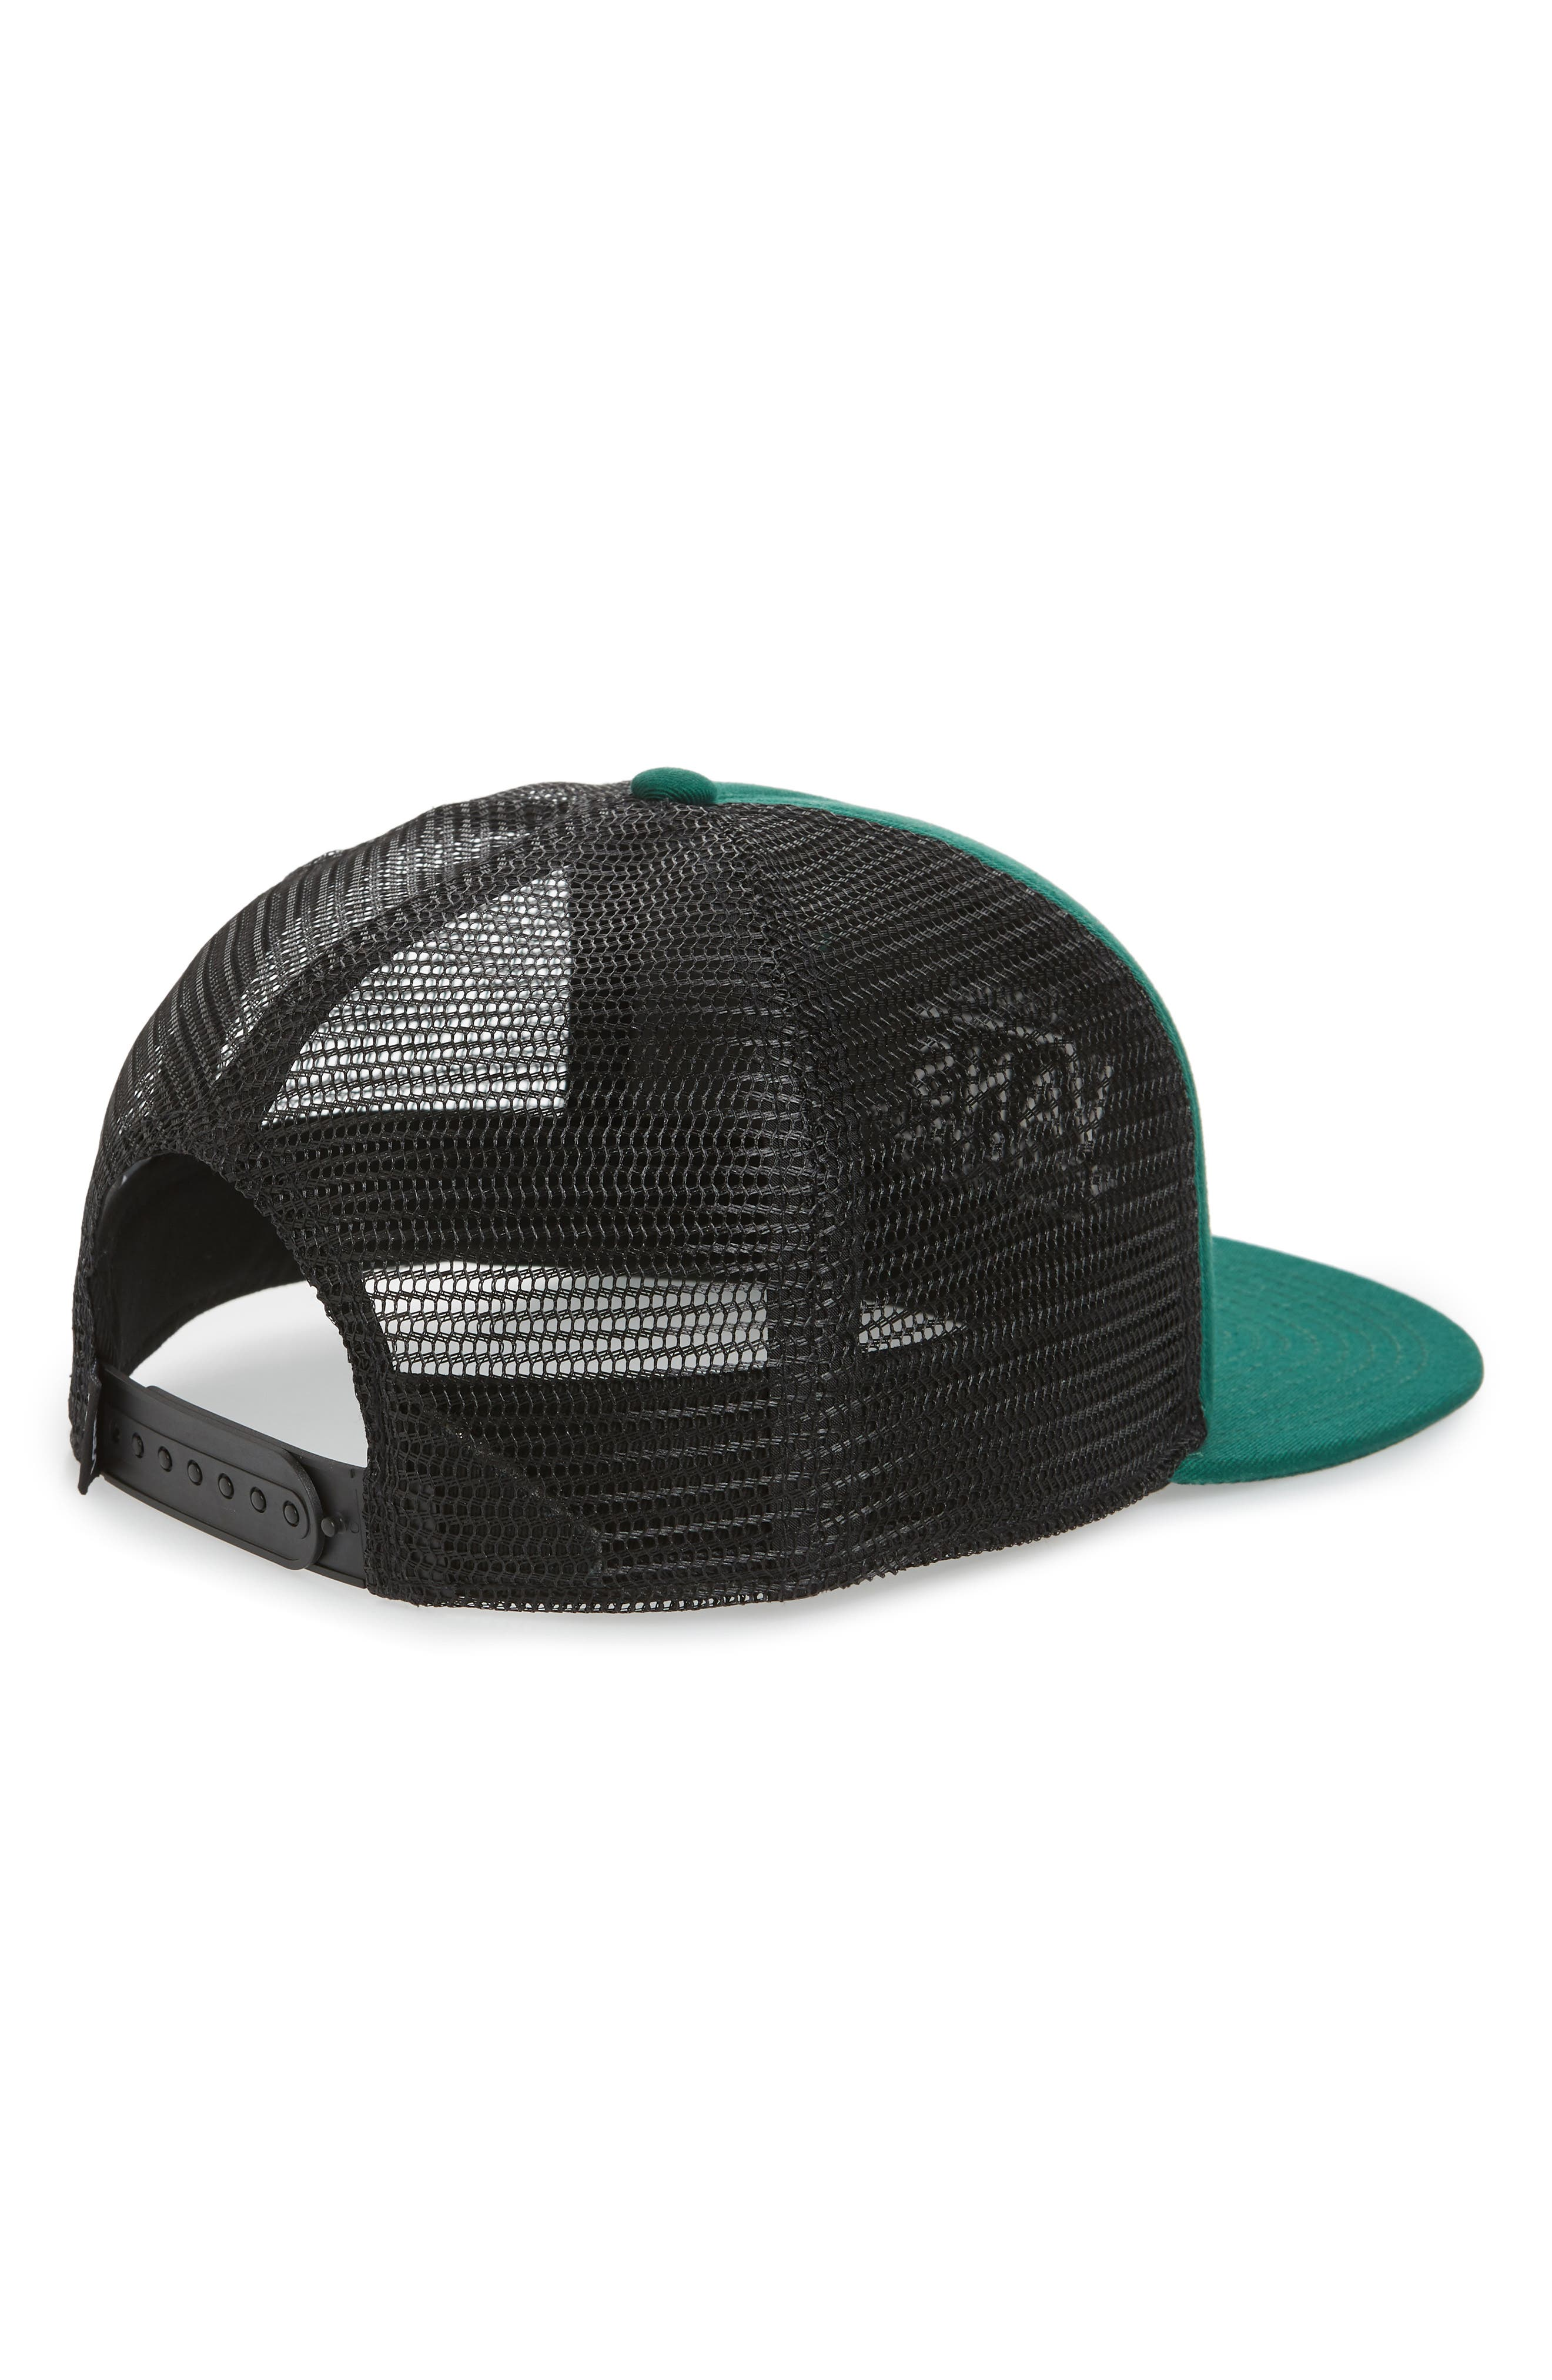 VANS,                             Galer Embroidered Trucker Hat,                             Alternate thumbnail 2, color,                             EVERGREEN